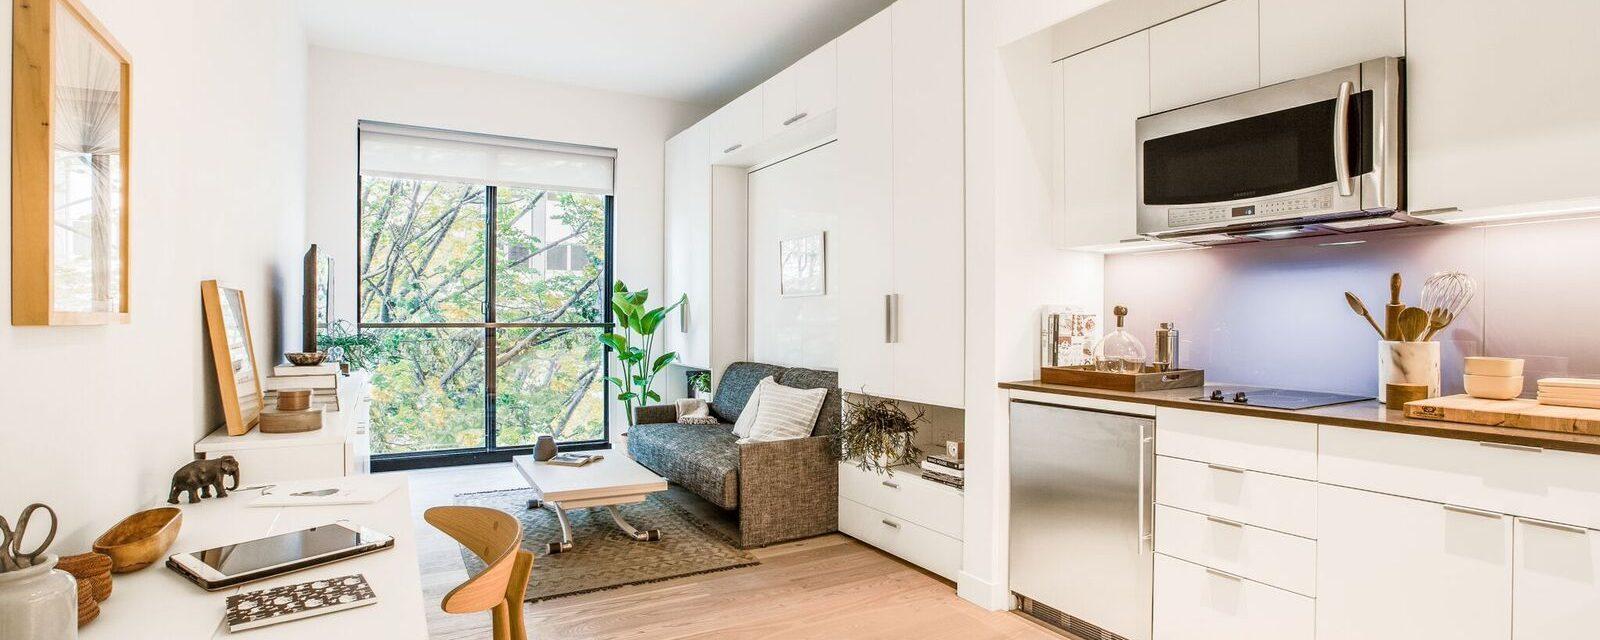 100 apartment mini model office stuff amazon com for Apartment mini model